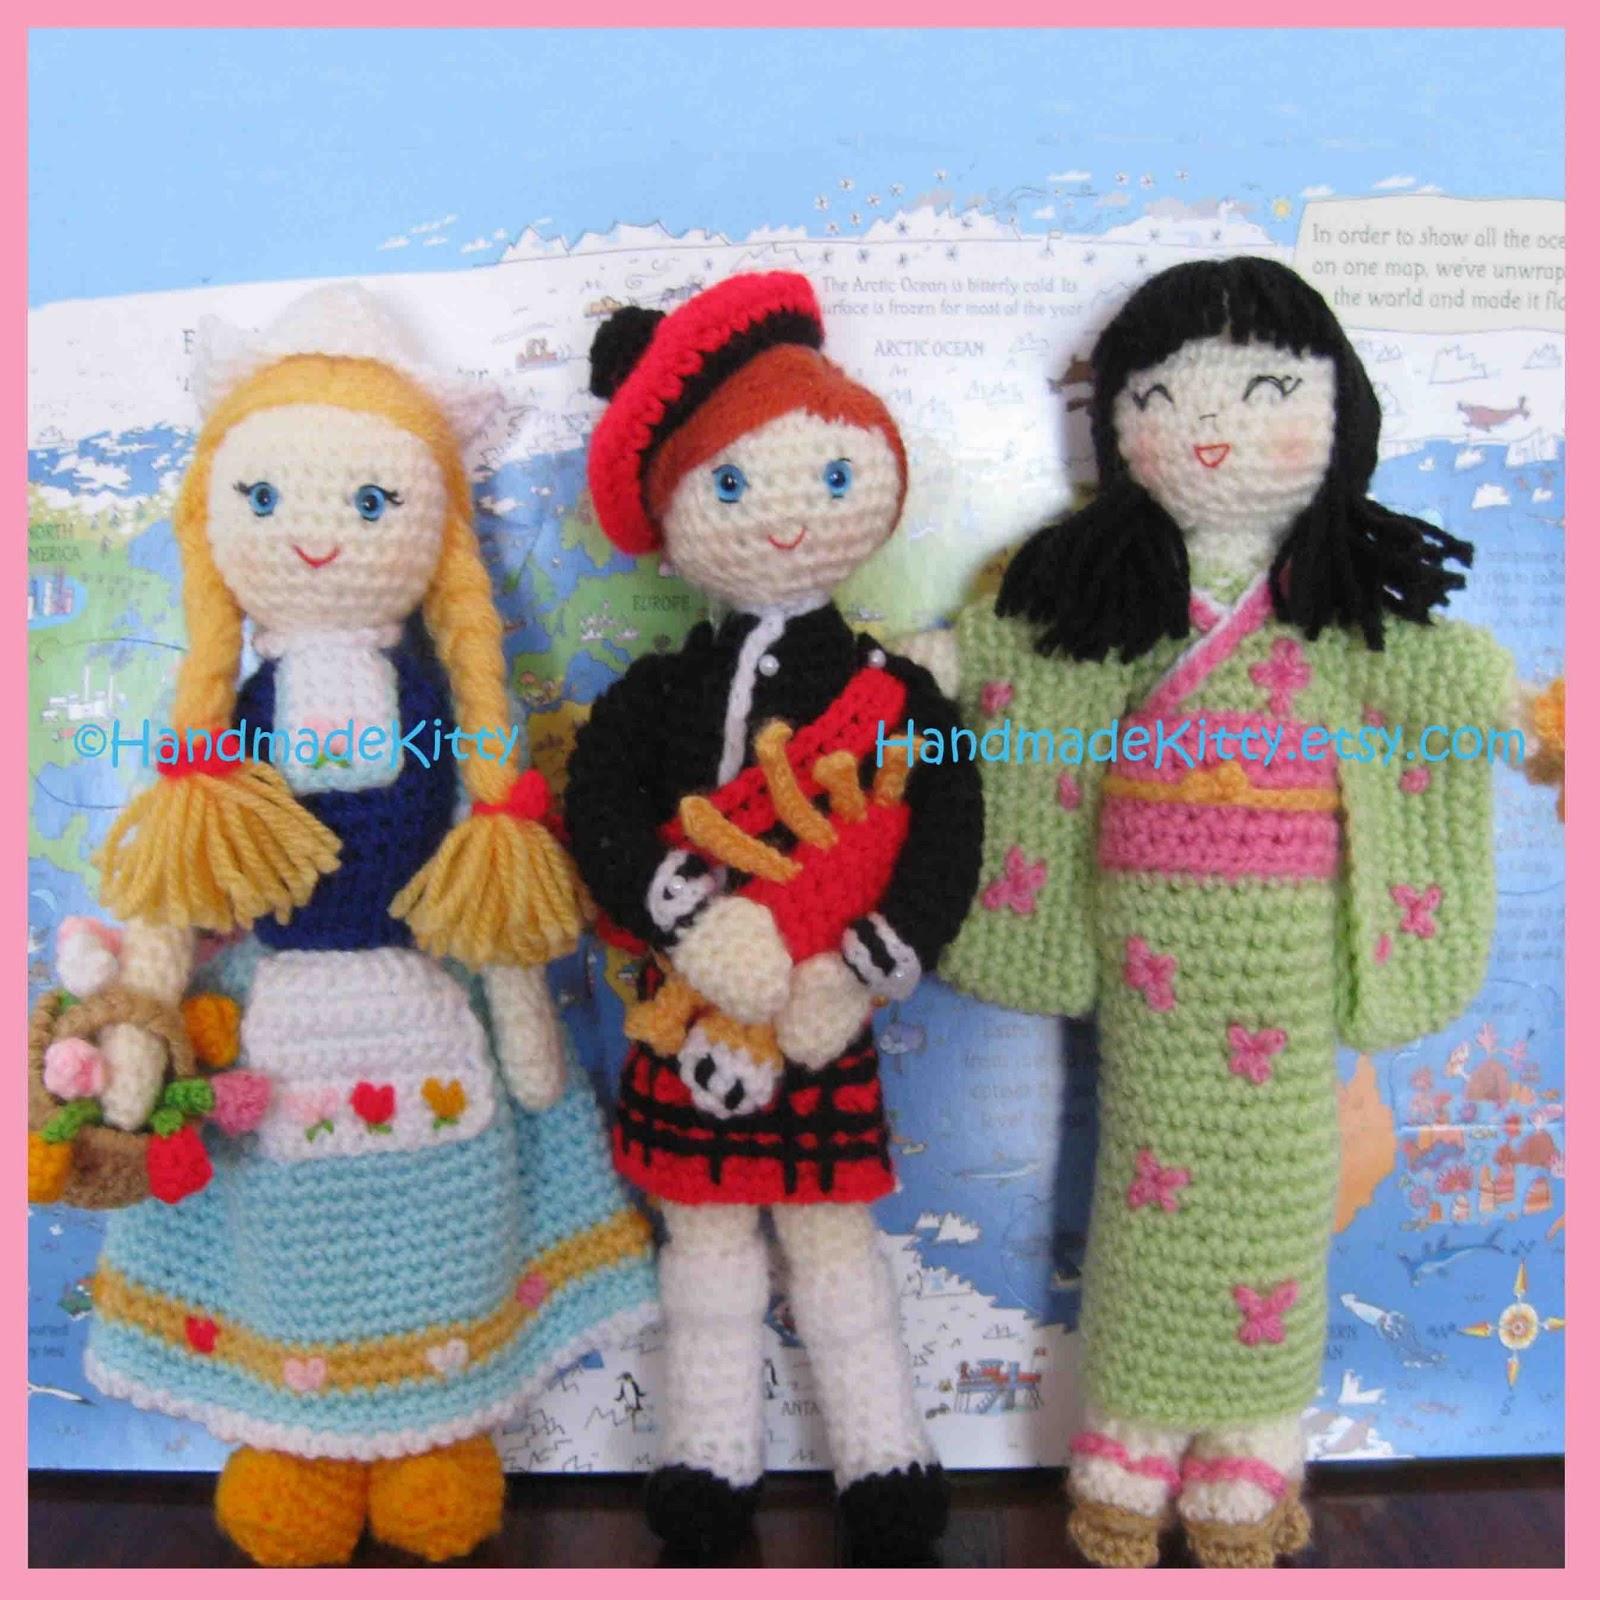 Japanese Amigurumi Doll Patterns : HandmadeKitty: Regional Dolls Dutch Scottish Japanese ...